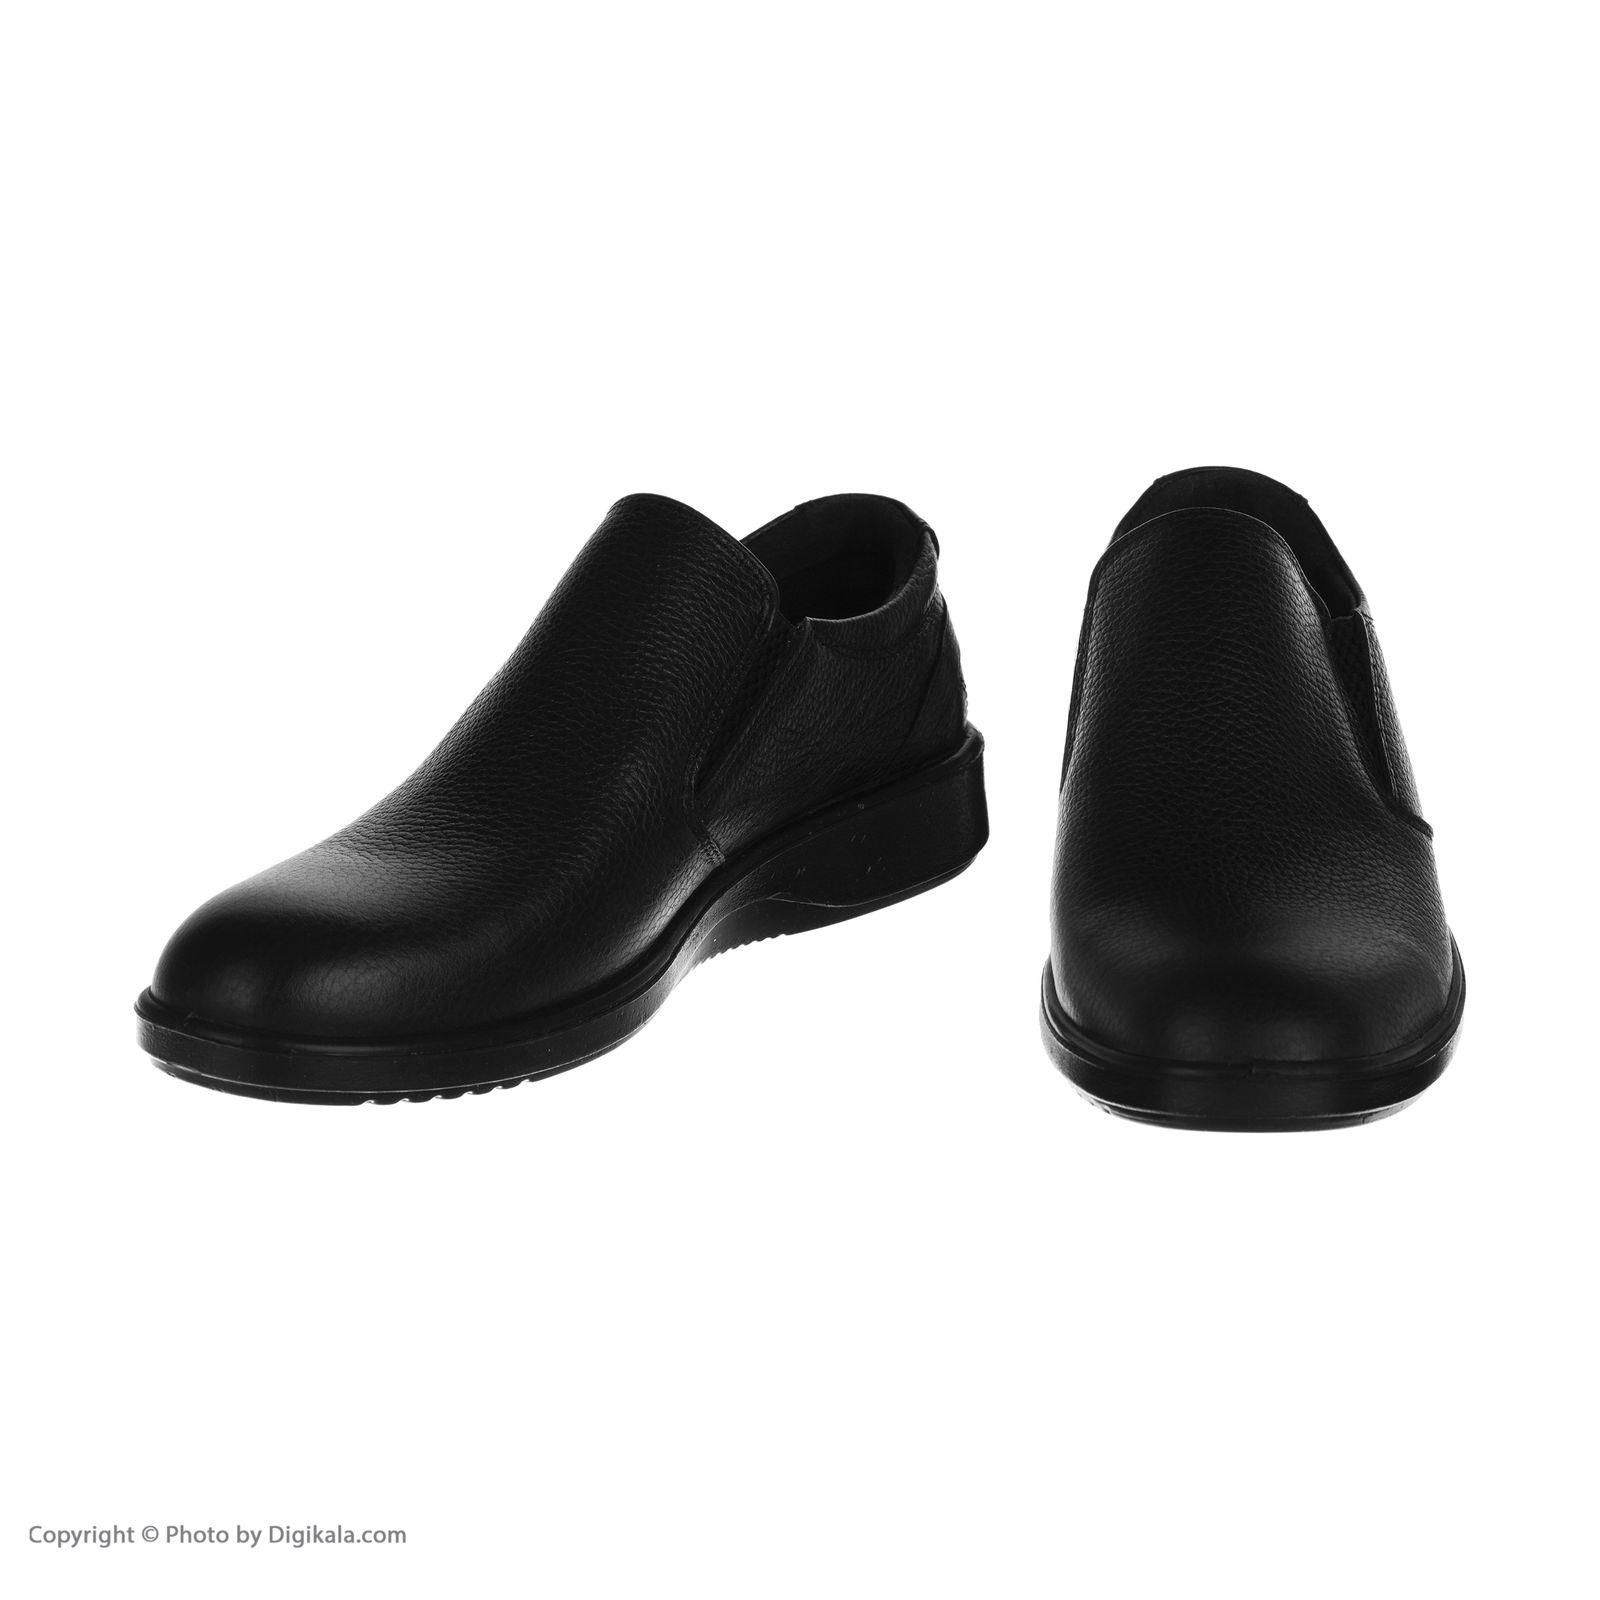 کفش روزمره مردانه ریمکس مدل 7327A503101 -  - 6